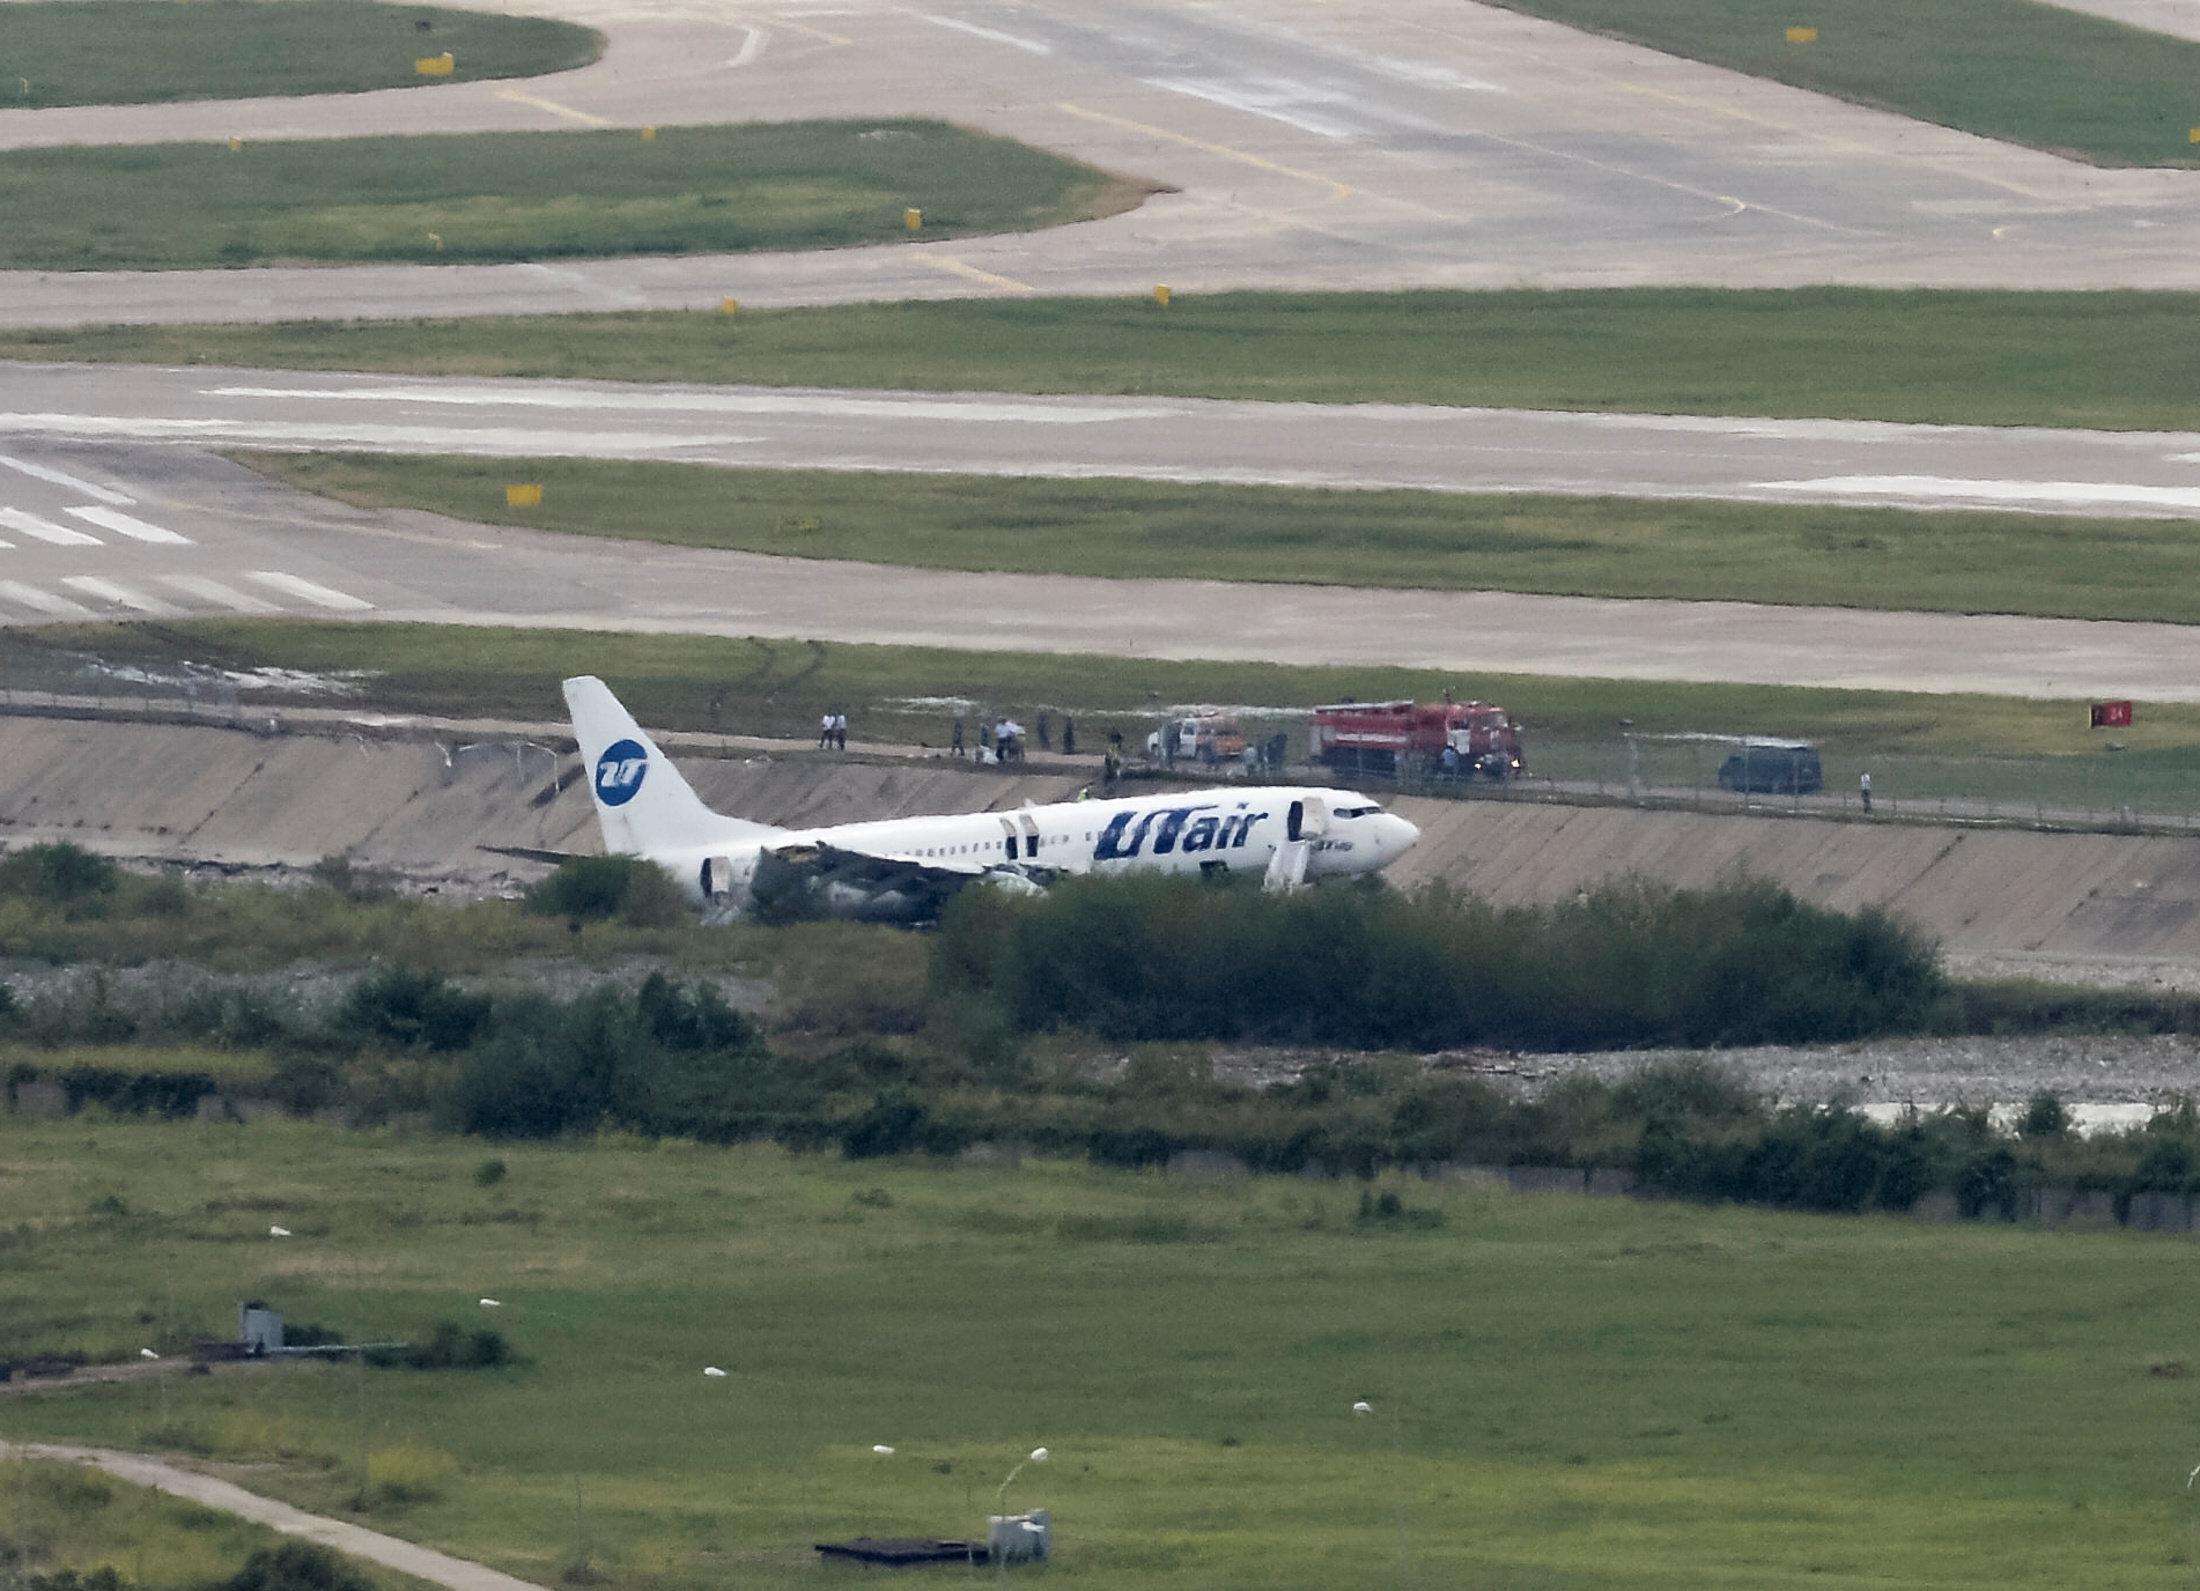 Utair Boeing 737-800 passenger plane is seen off an airport runway in Sochi, Russia September 1, 2018.  REUTERS/Stringer